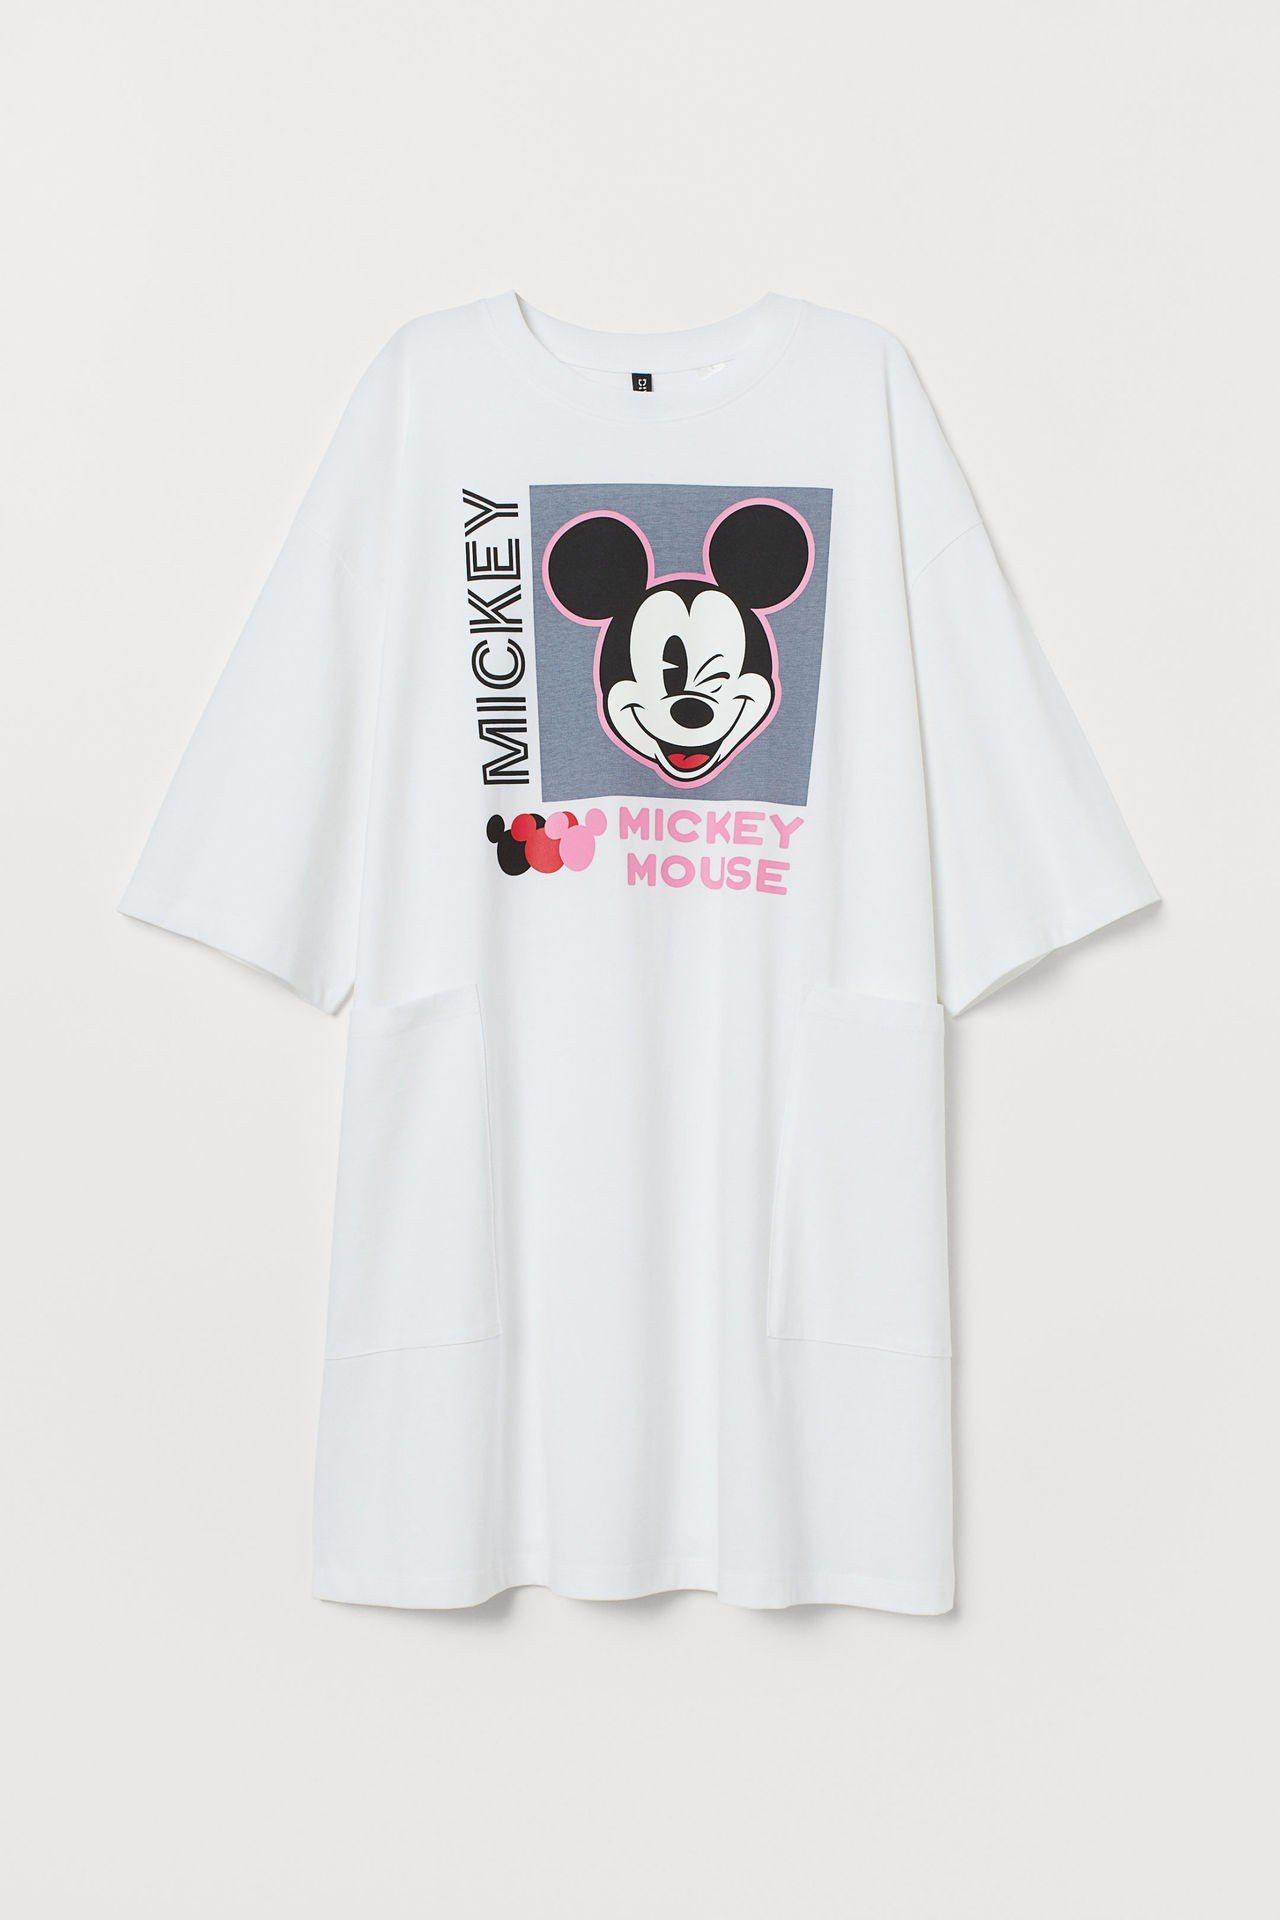 H&M亞洲時尚米奇合作系列單品,售價499元。圖/H&M提供